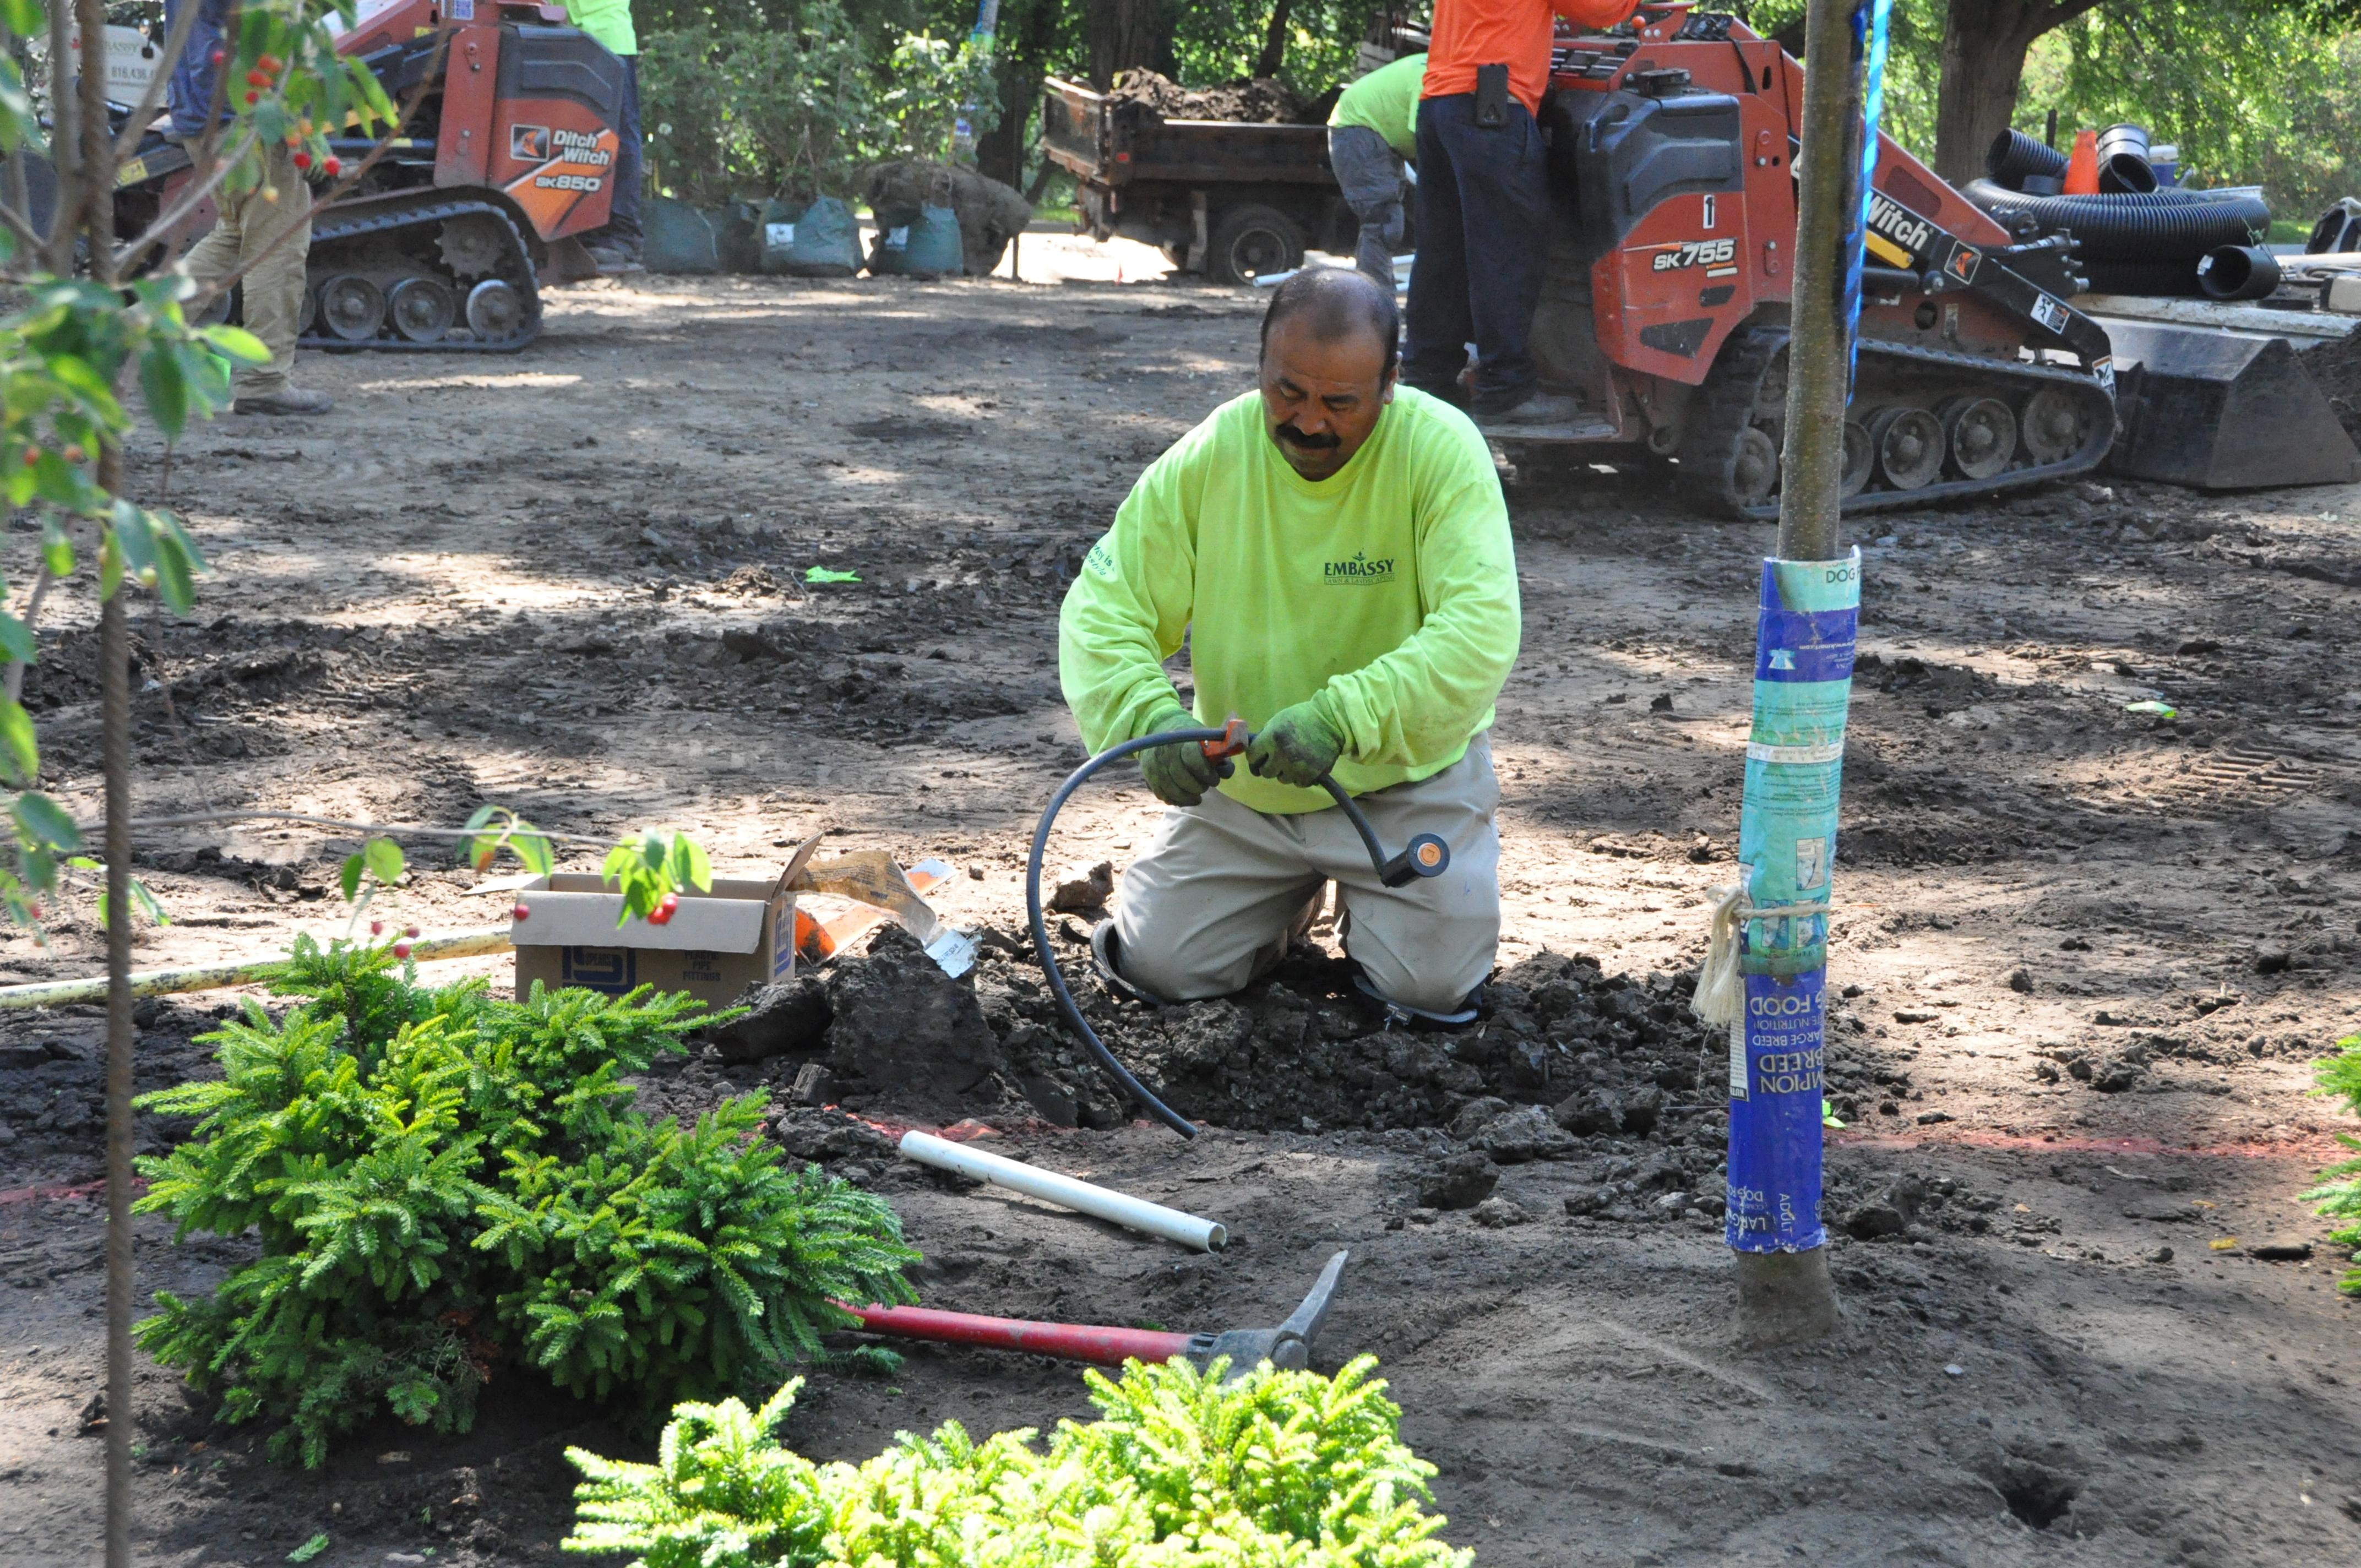 Embassy irrigation crew